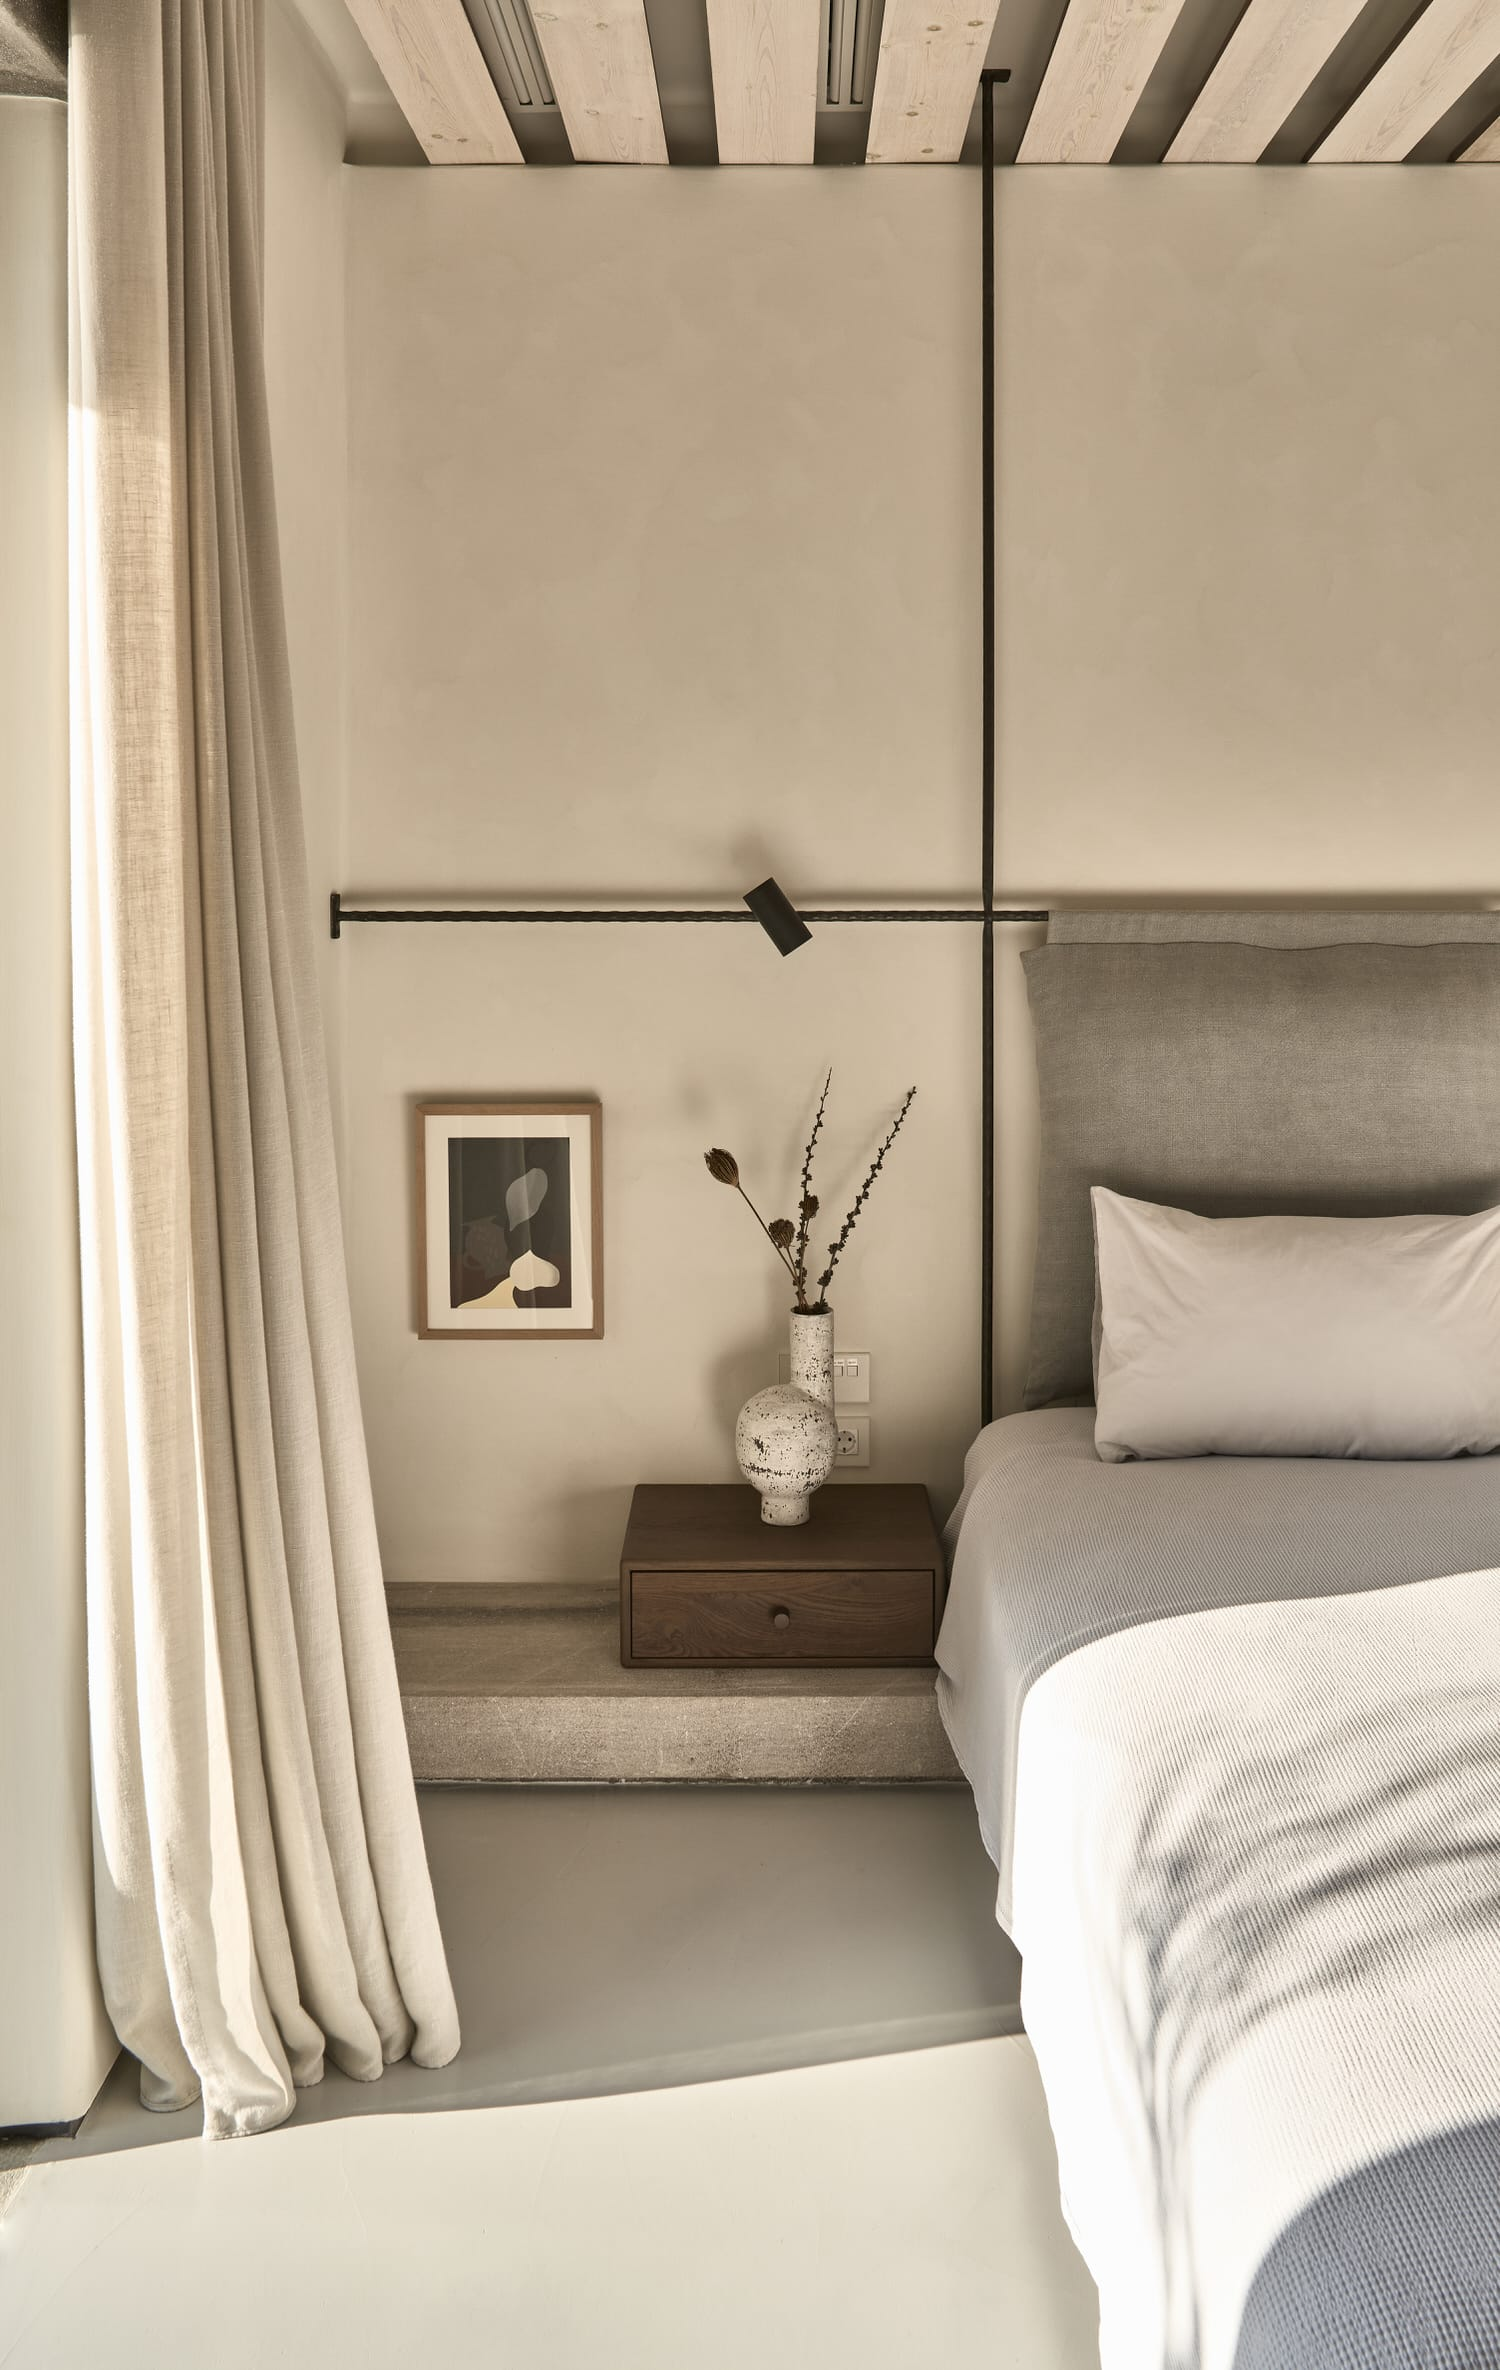 K-Studio, Villa Mandra Mykonos, Luxury Accommodation, Photo Claus Brechenmacher & Reiner Baumann | Yellowtrace